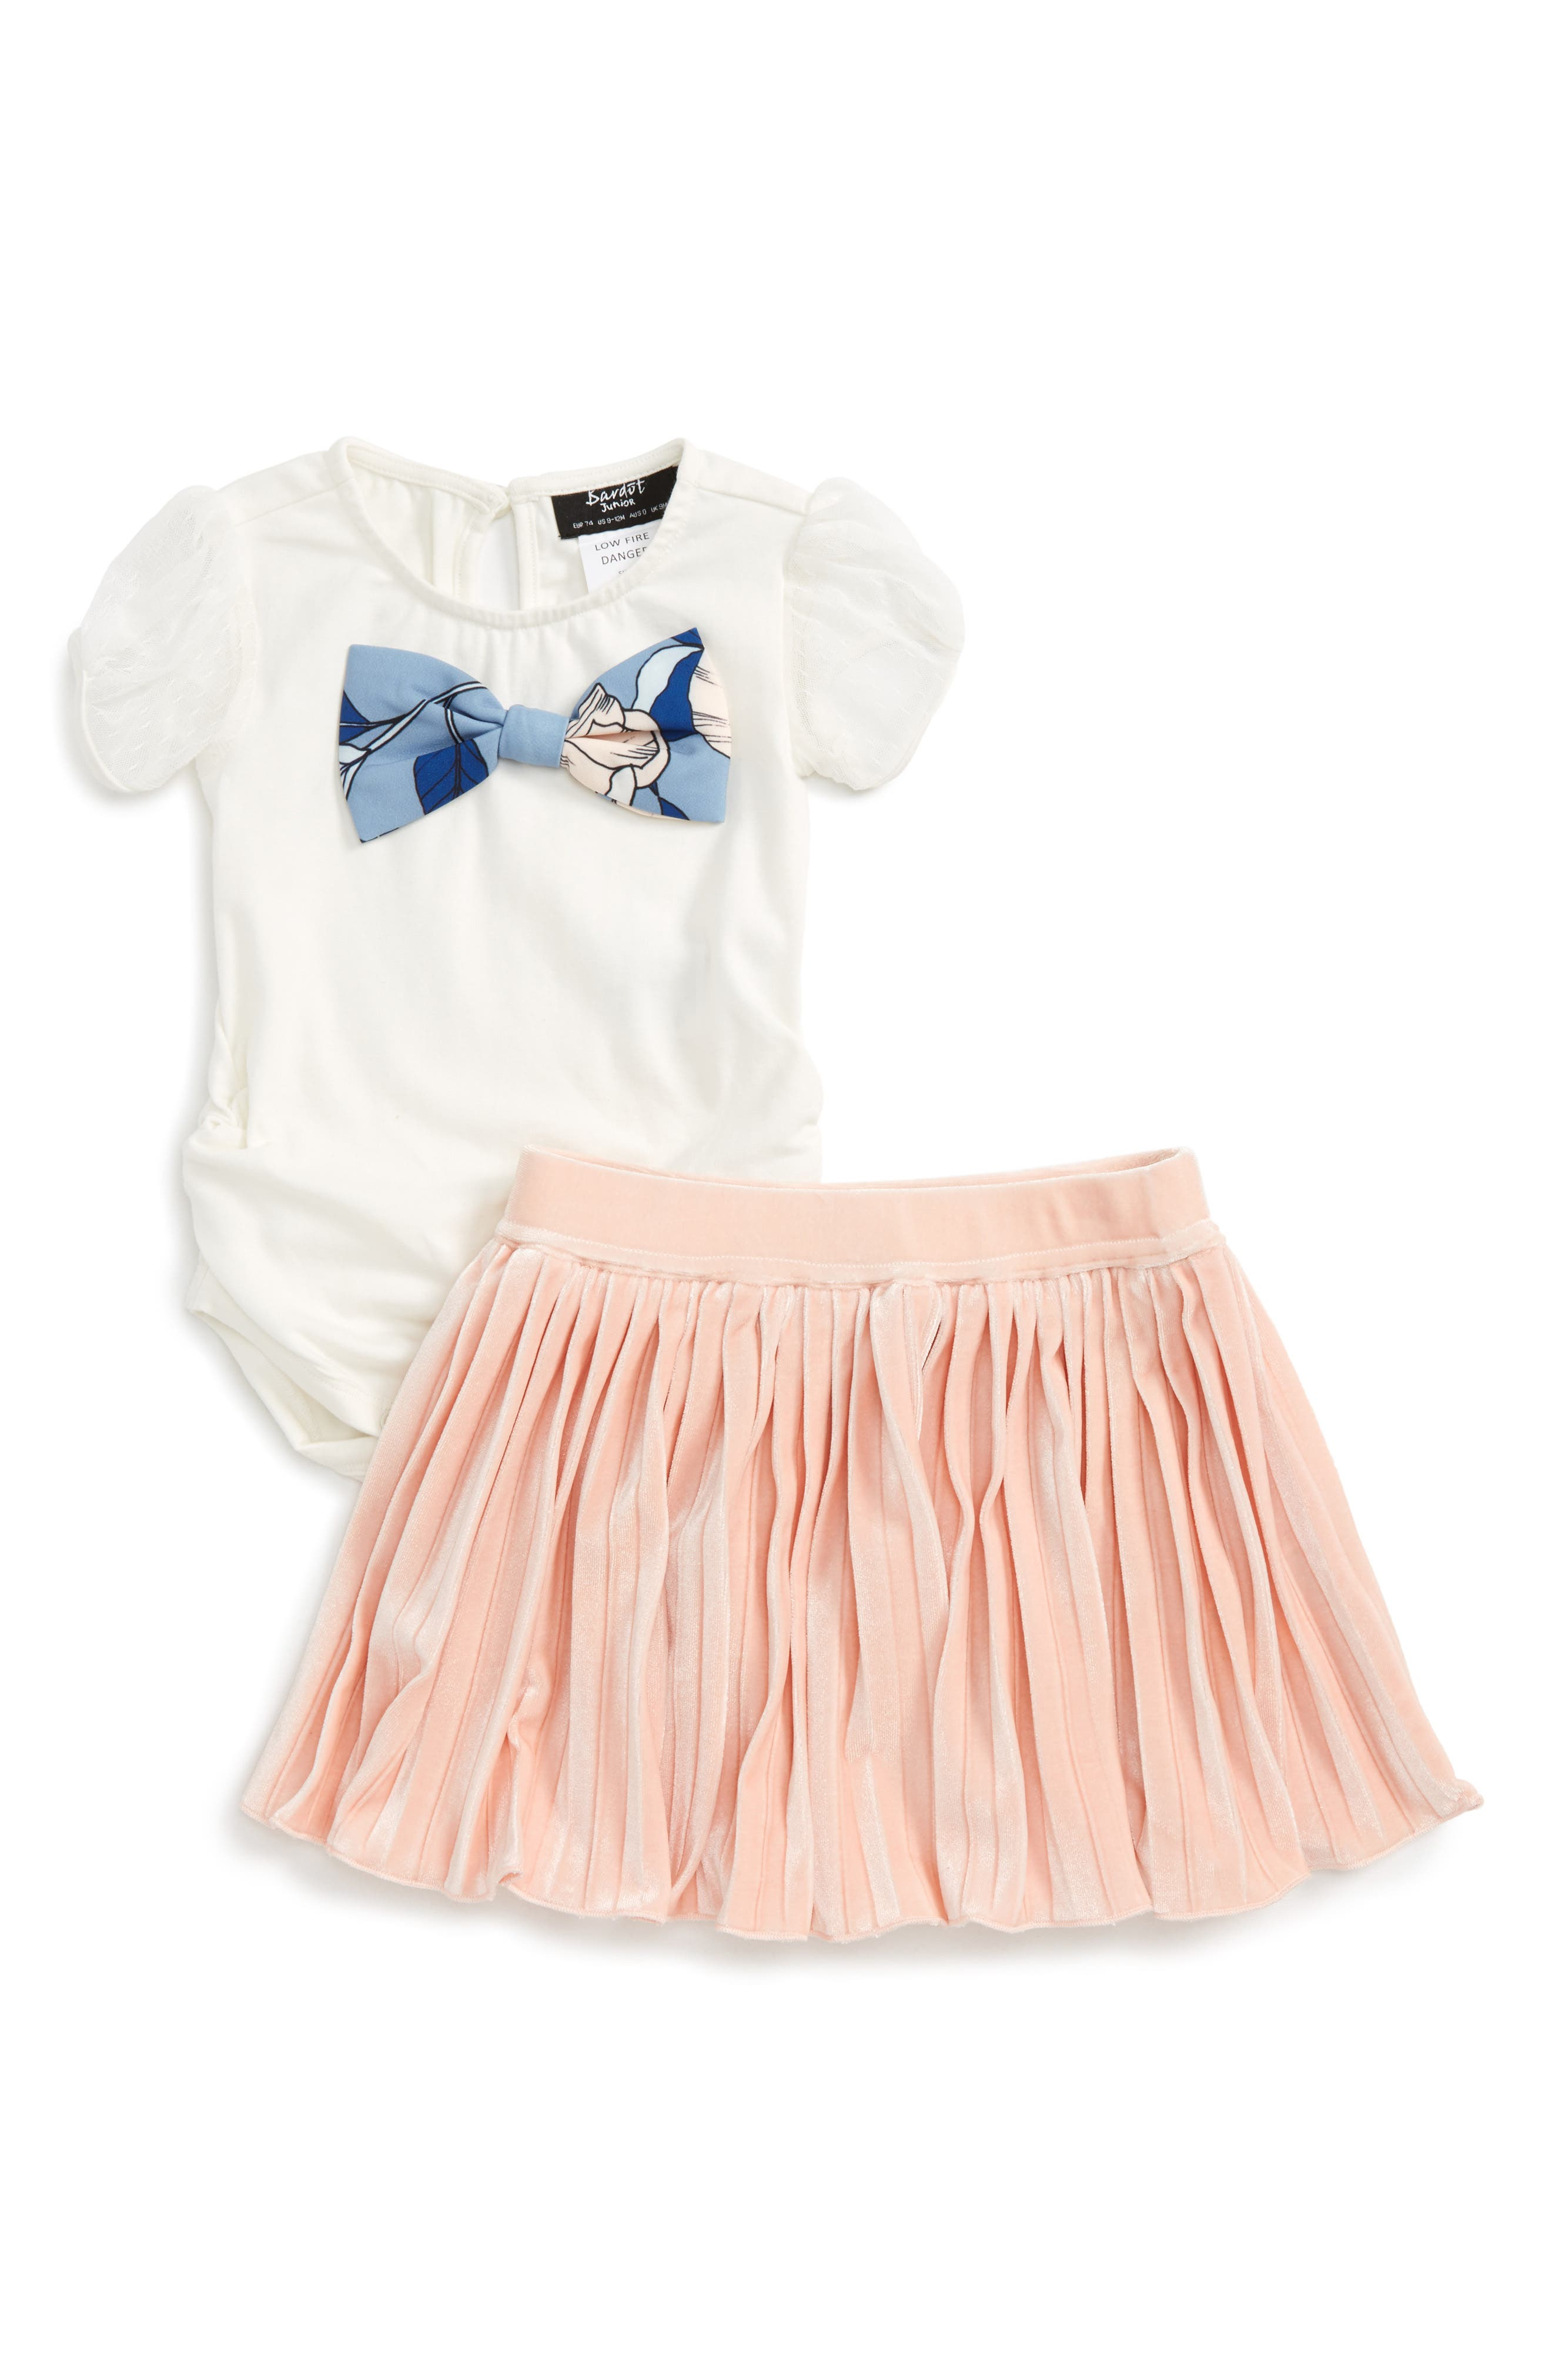 Main Image - Bardot Junior Bow Top & Pleated Skirt Set (Baby Girls & Toddler Girls)